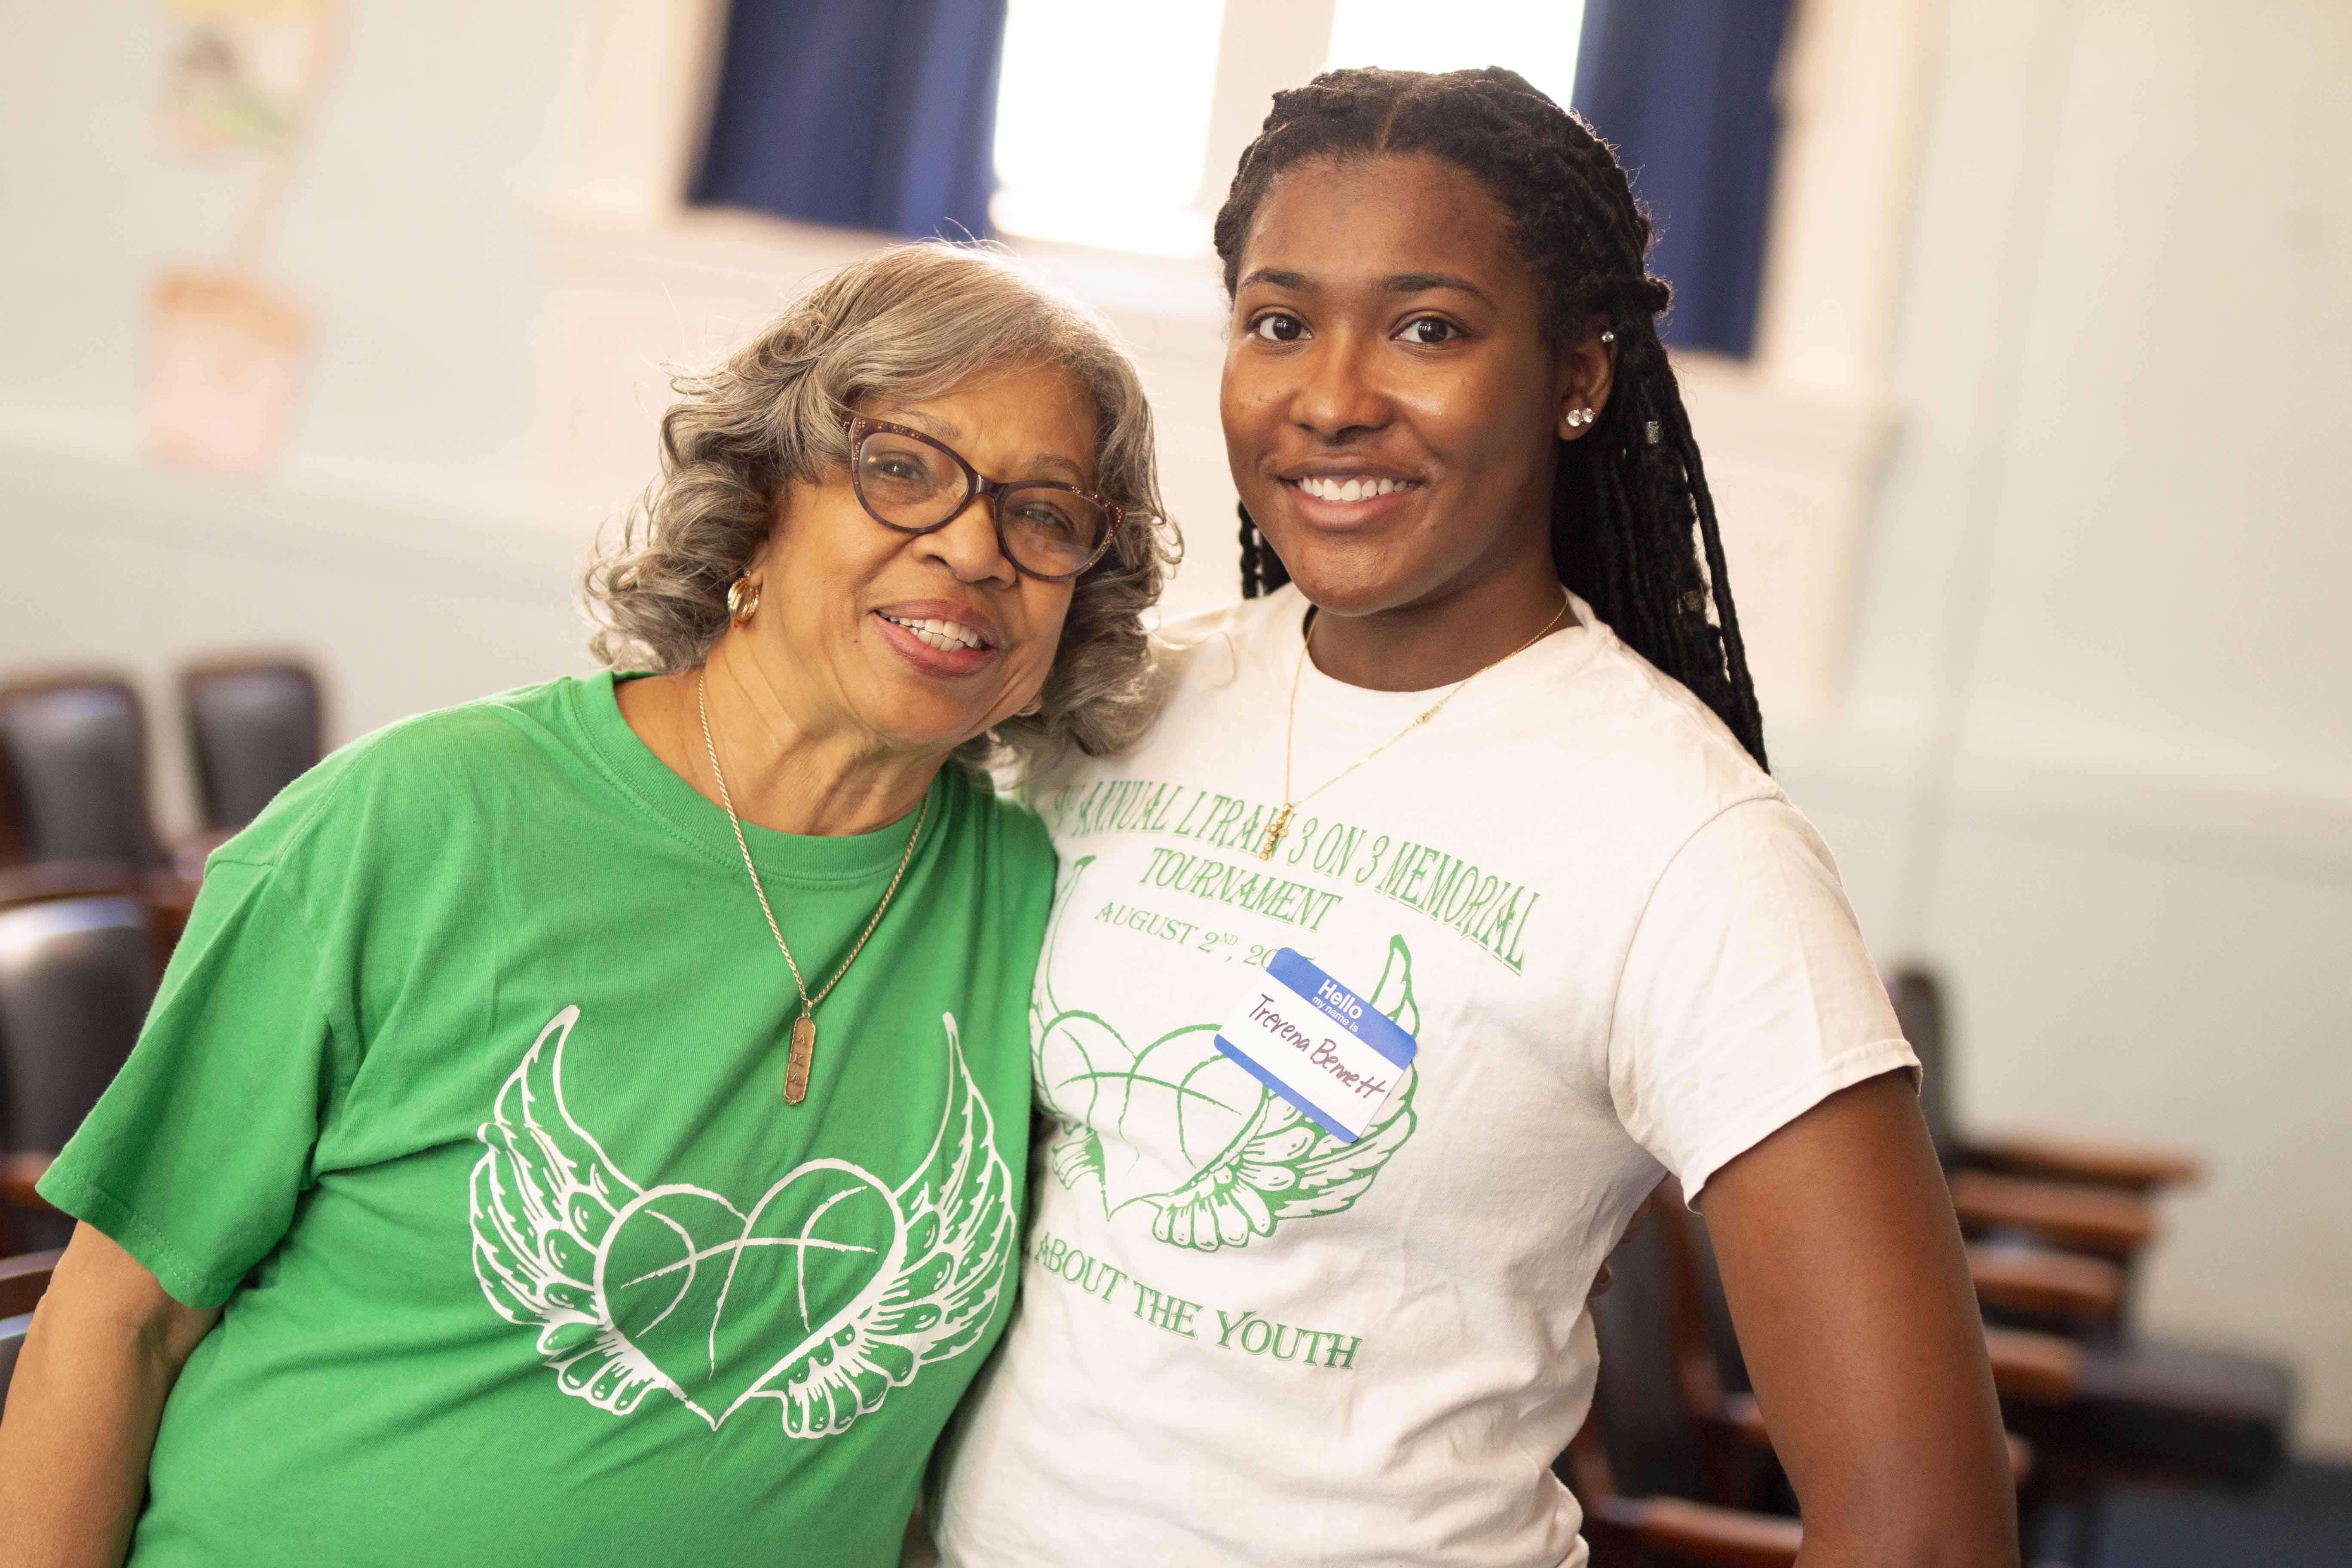 L-Train Memorial - #SupportASon (Heywood Avenue Elementary School, Orange NJ) 06-09-18_0024